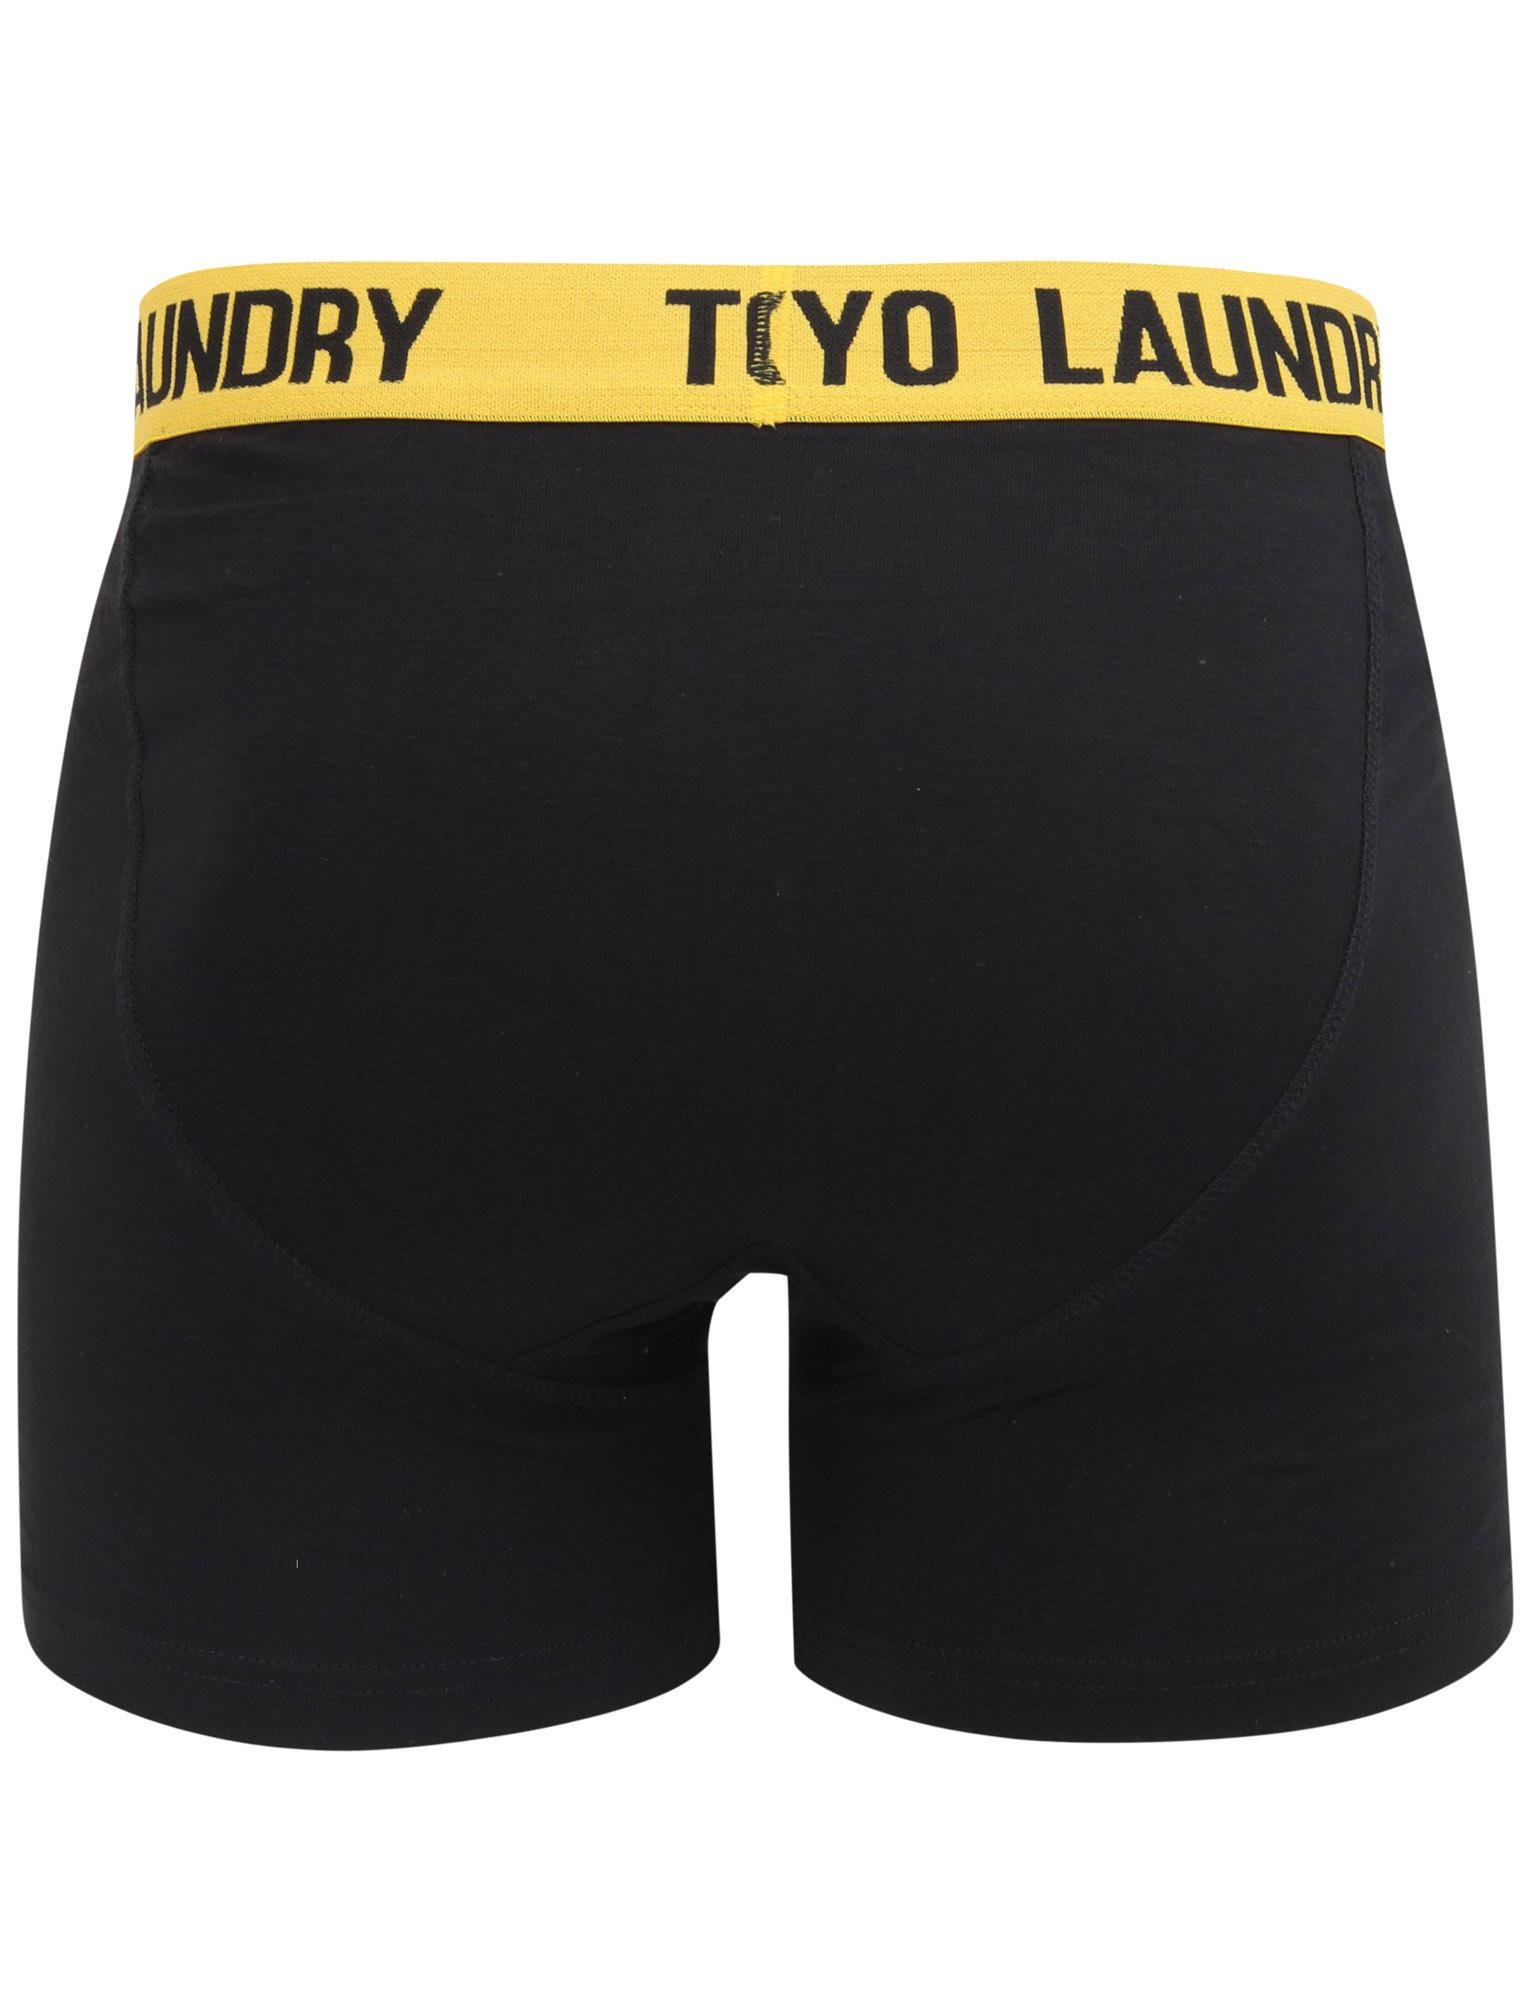 New-Mens-Tokyo-Laundry-2-Pack-Buttoned-Cotton-Rich-Boxer-Shorts-Set-Size-S-XXL thumbnail 19